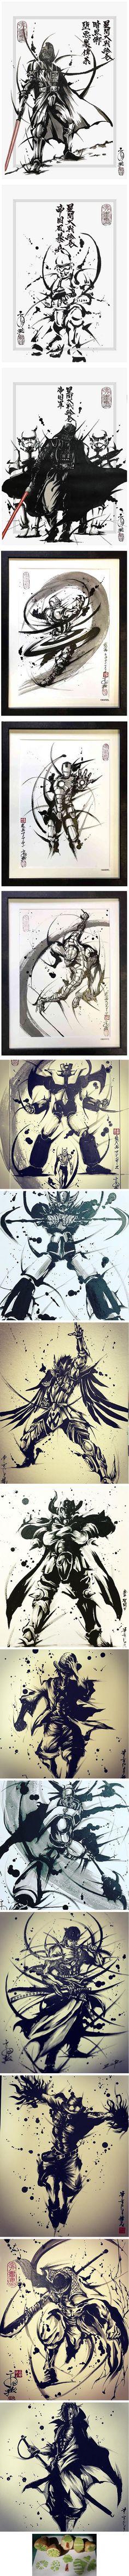 "Artist Masayuki Kojo turns fiction characters into awesome art in ""Suiboku-ga"" ink wash painting style"